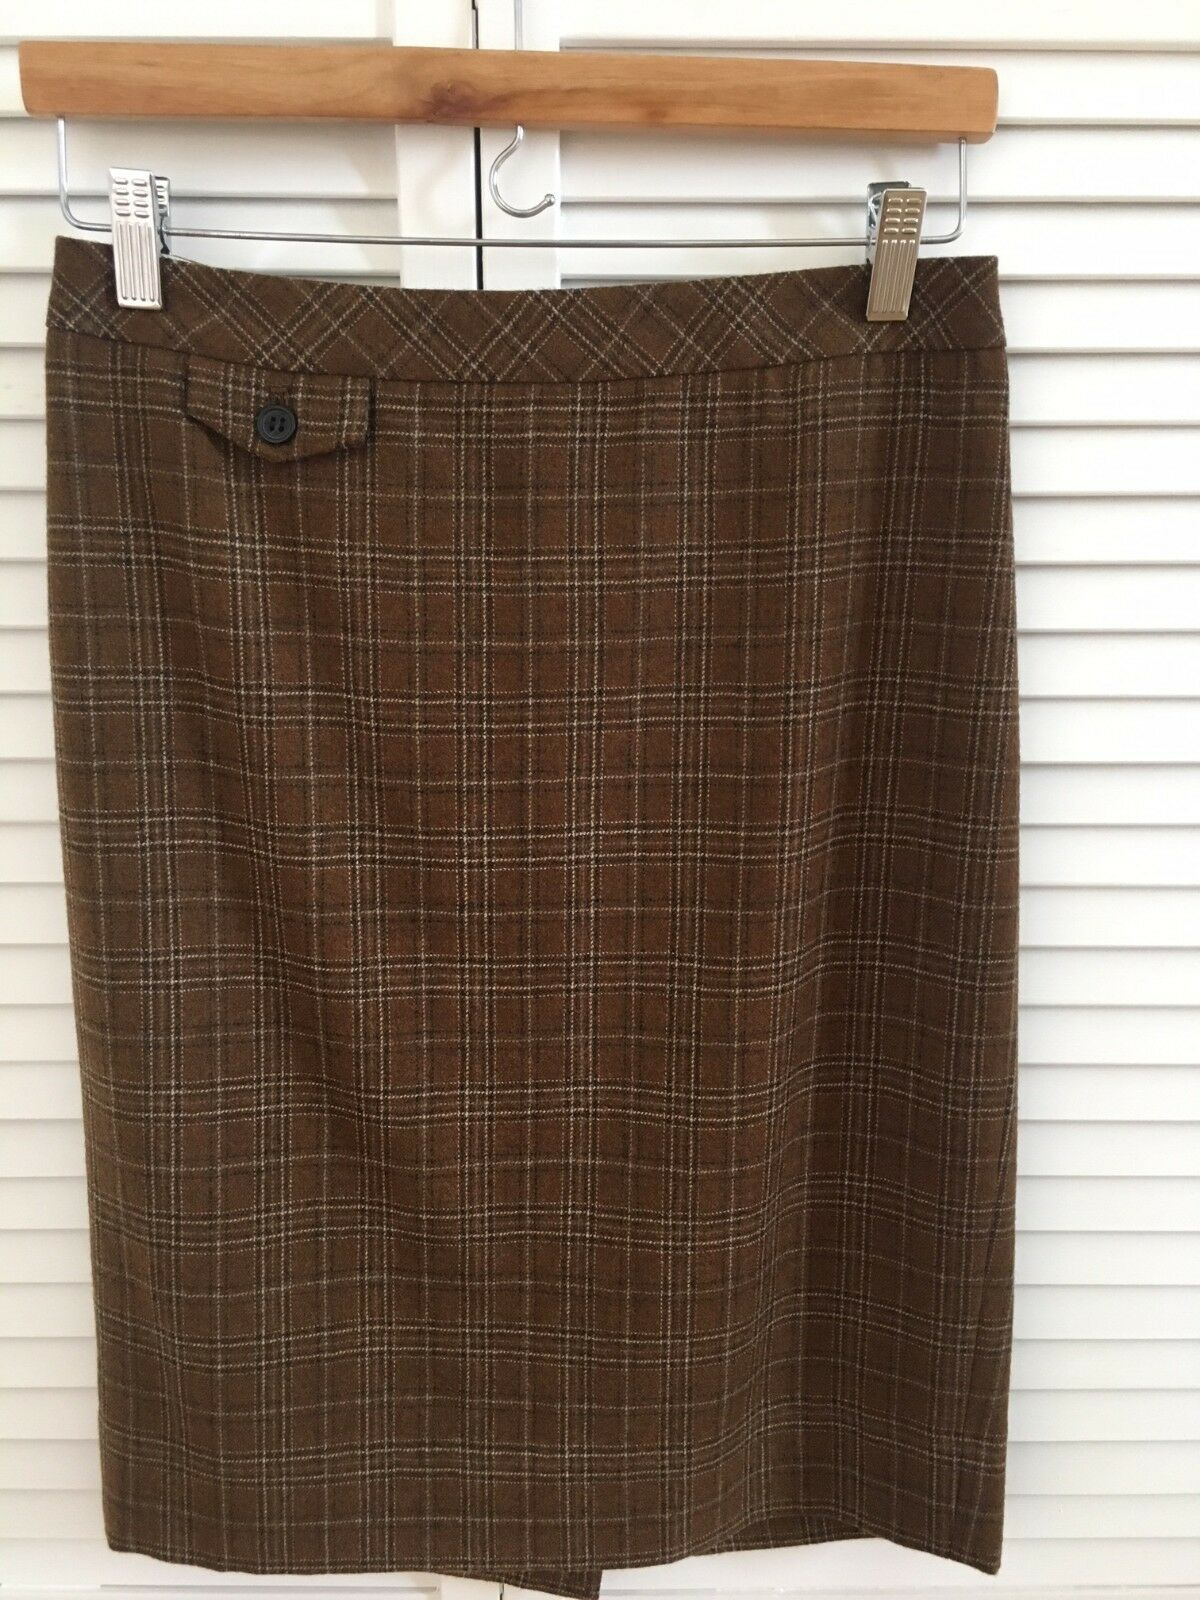 NWT J Crew No. 2 Pencil Skirt Brown Plaid 100% Wool Size 2